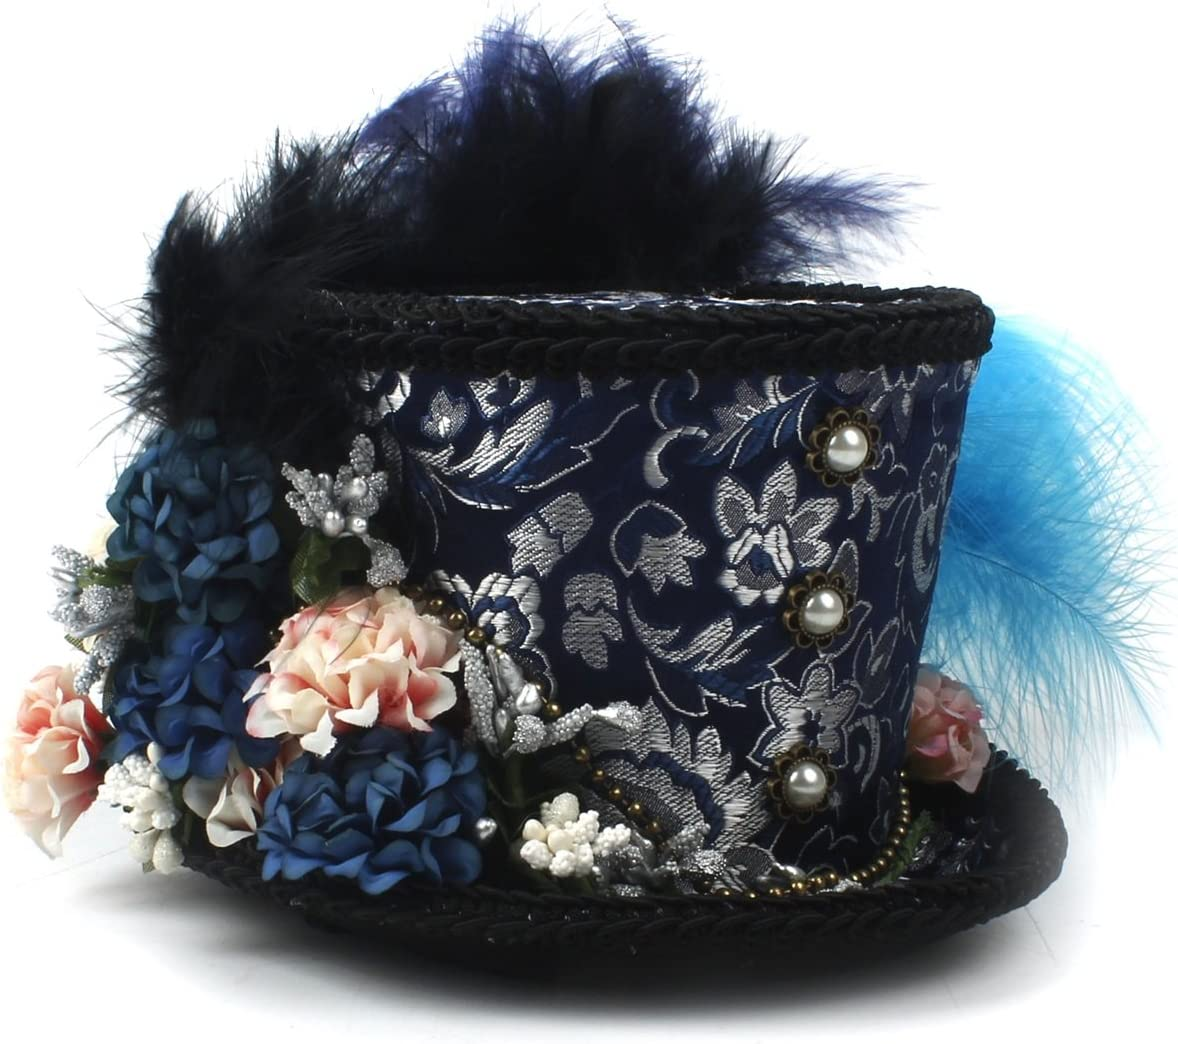 RZL Domo Sombreros, Mini Sombrero de Copa, Turquesa y Sombrero Púrpura, Kentucky Derby Rainbow Hat, Royal Ascot, Sombrero de Carrera de Caballos, Sombrero de Paisley Tea Party, Sombrero de Sombrerero